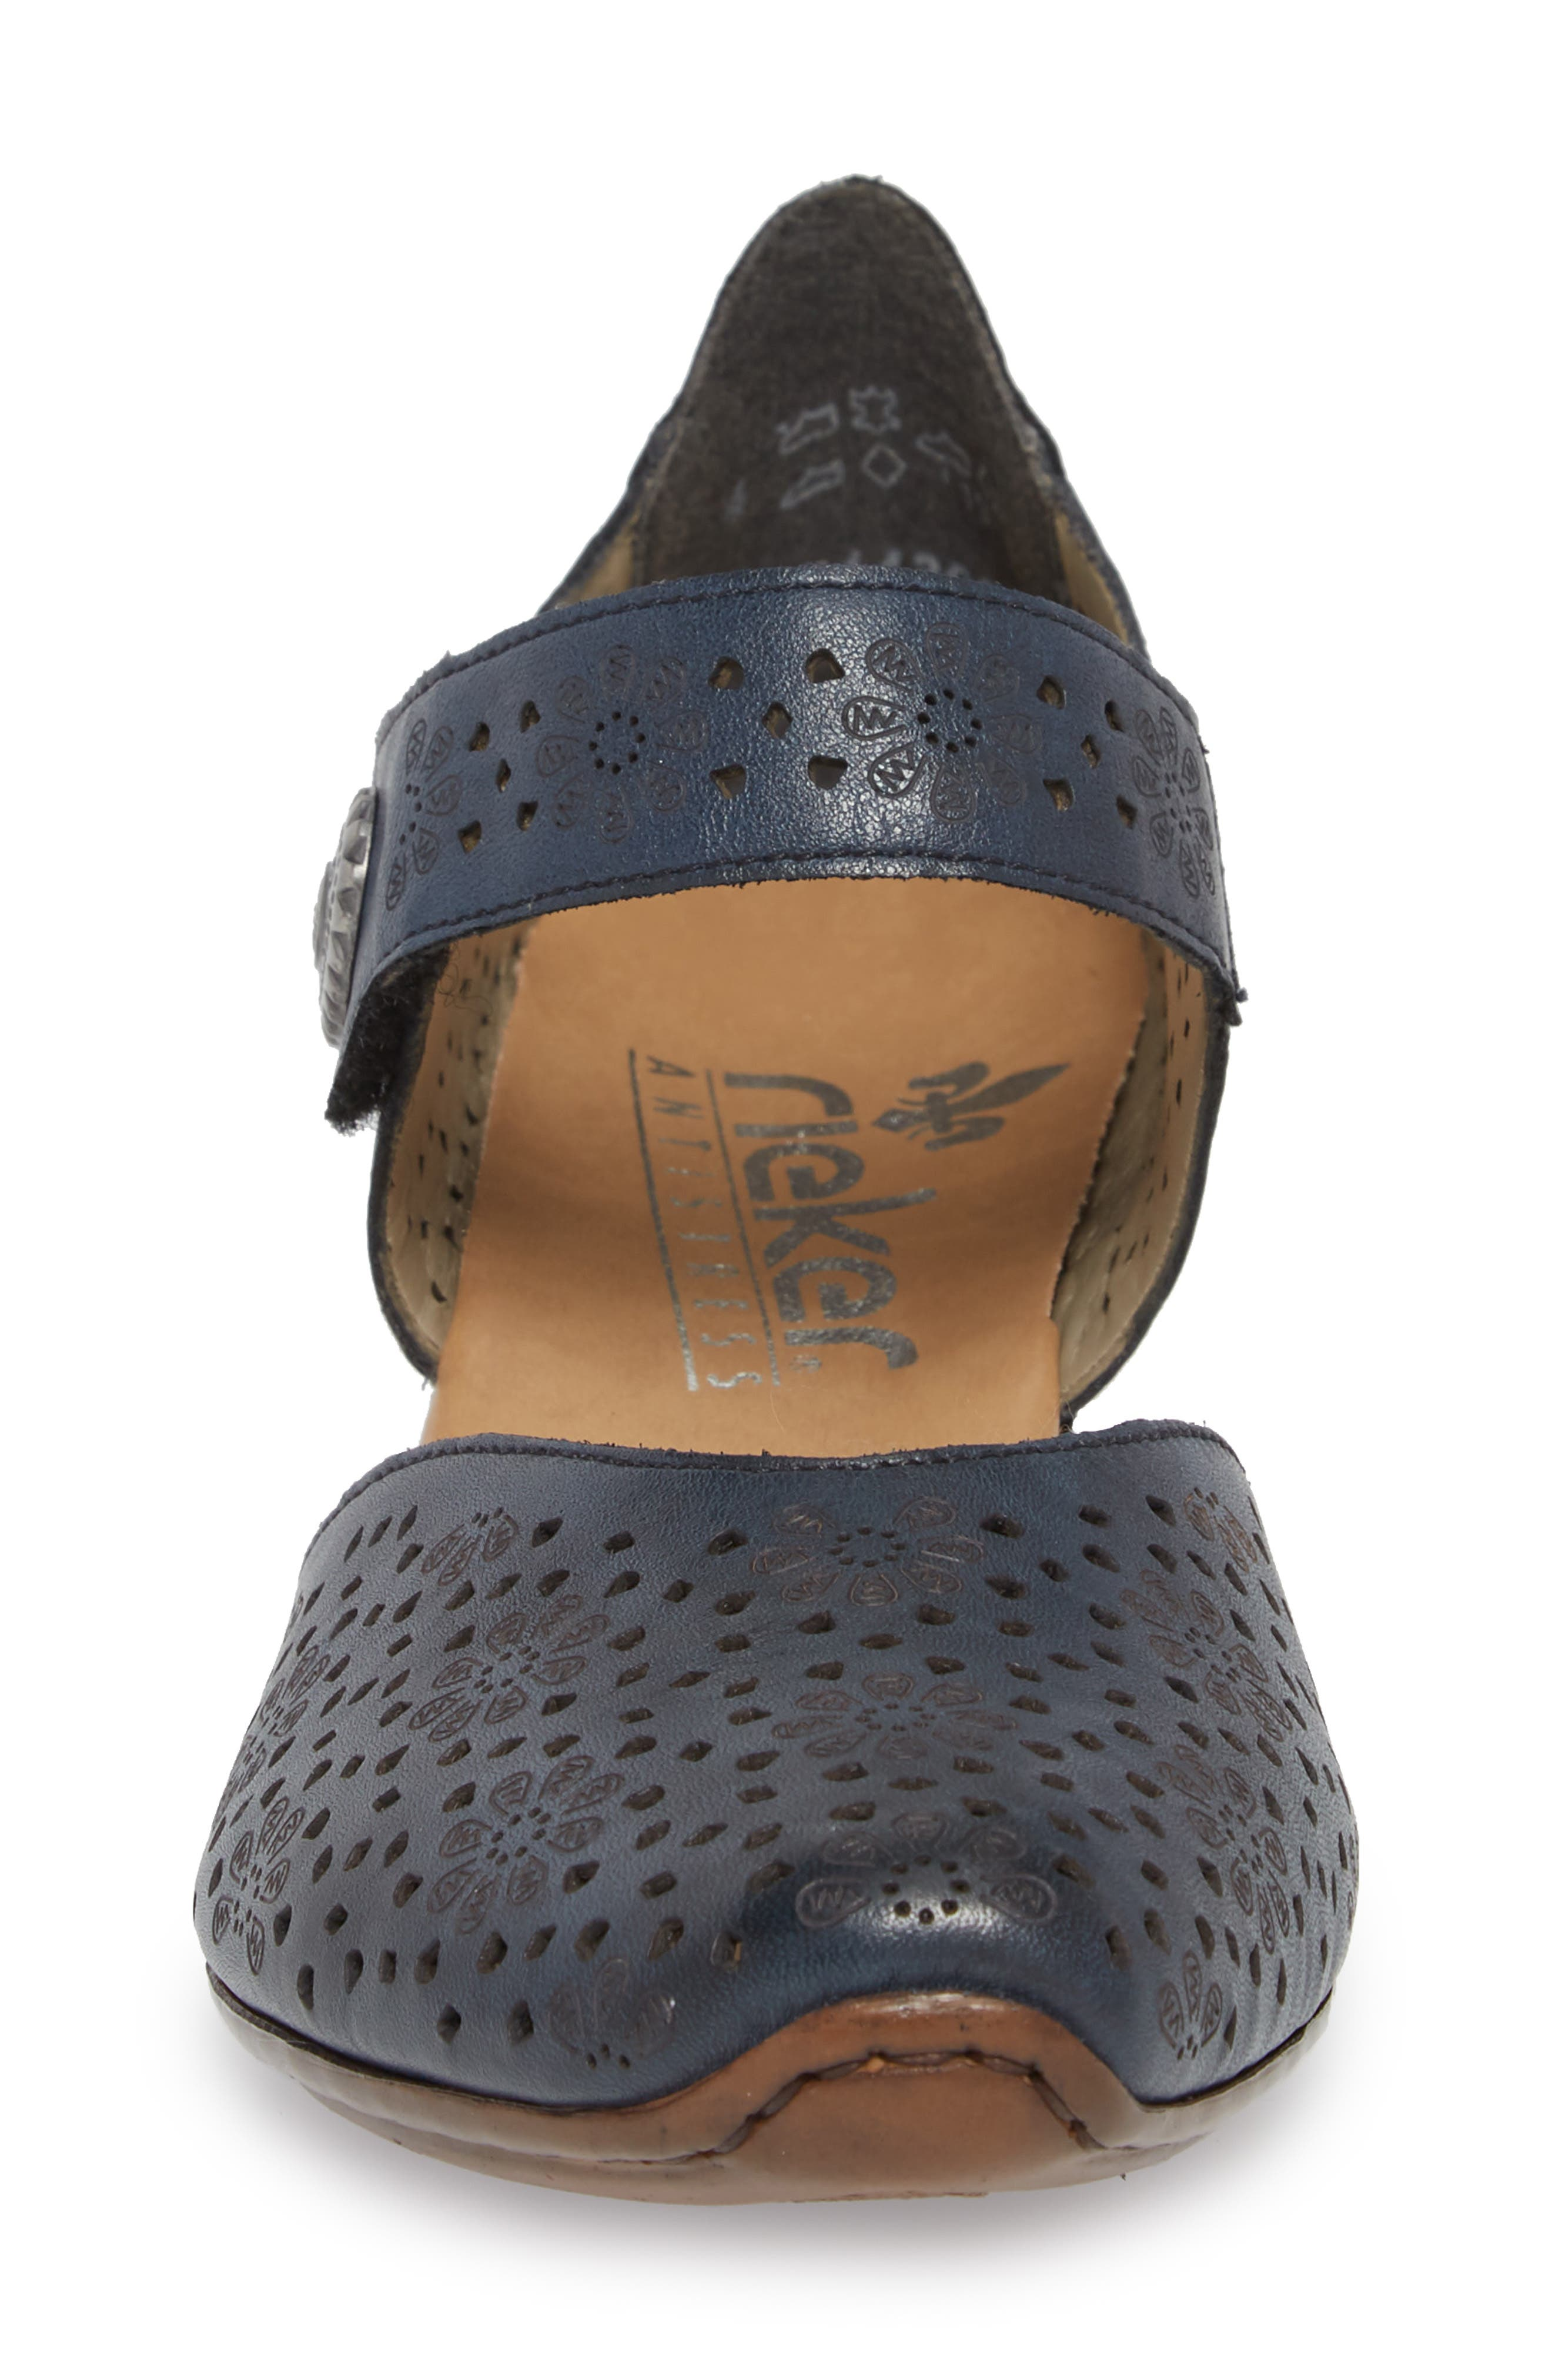 'Mirjam 11' Two-Piece Pump,                             Alternate thumbnail 4, color,                             Lake/ Royal Leather